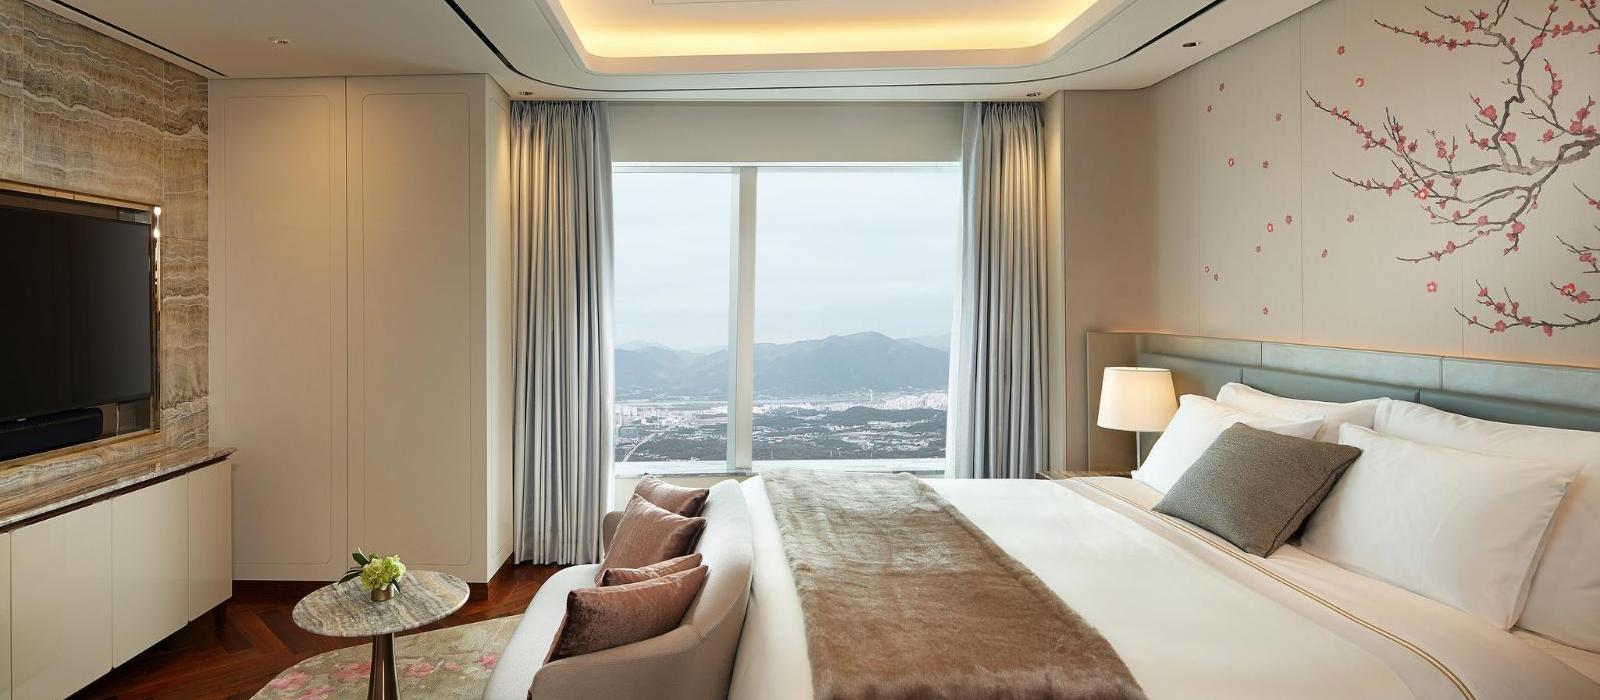 首尔赛格内尔酒店(Signiel Seoul) 图片  www.lhw.cn